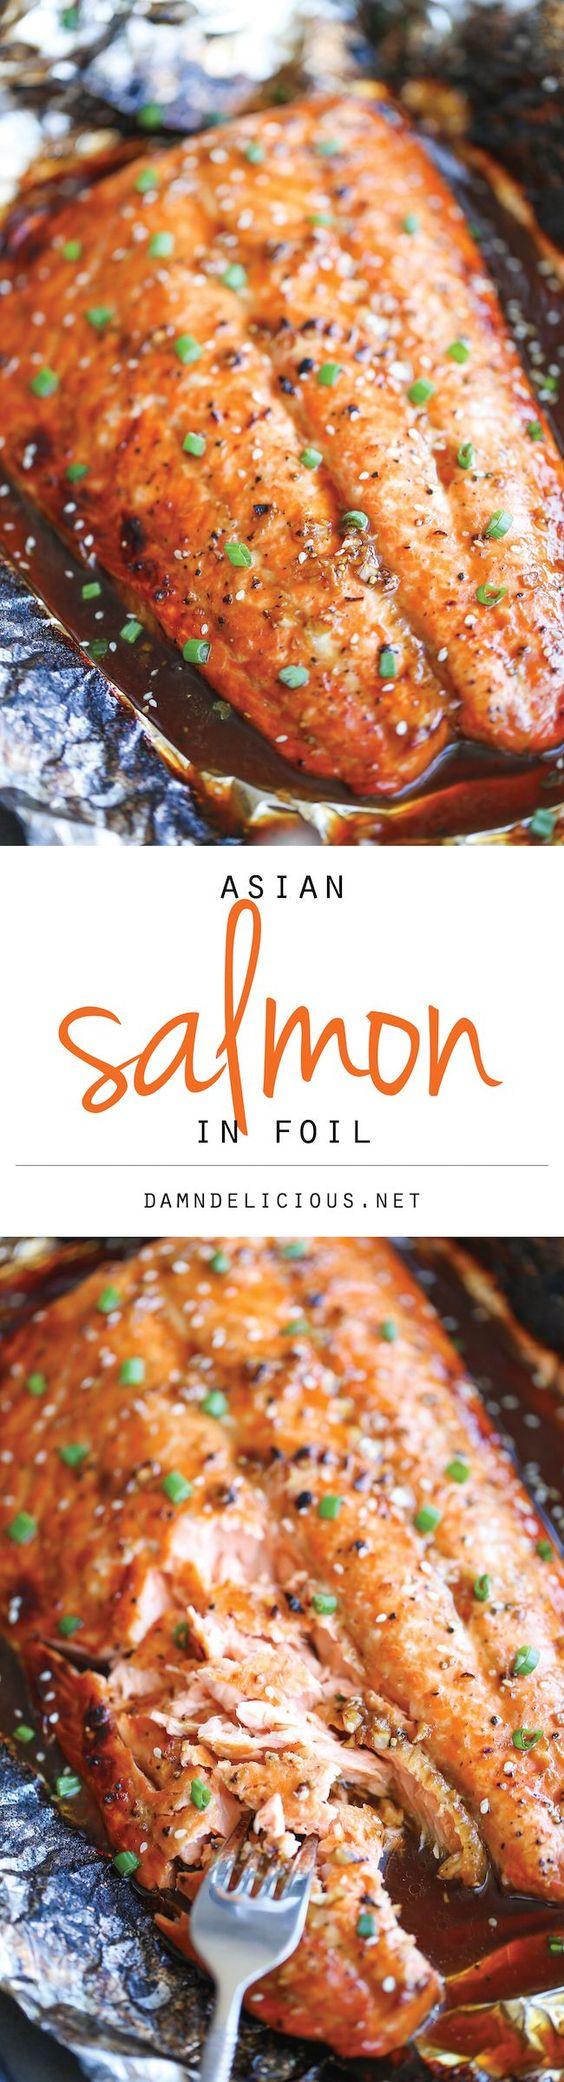 Asian Salmon in Foil